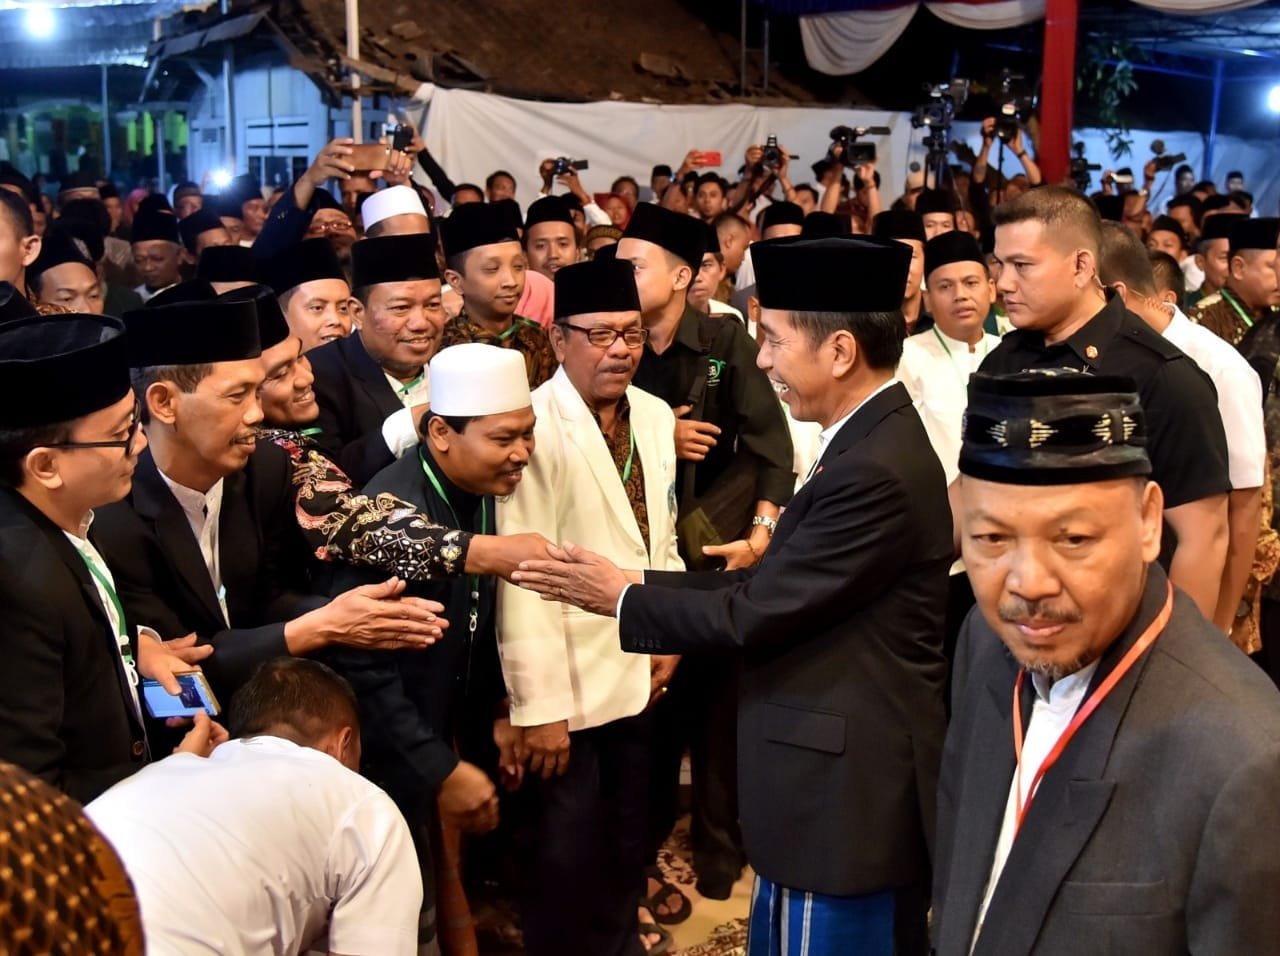 presiden-ingatkan-berprasangka-baik-adalah-budaya-dan-etika-bangsa-indonesia-9